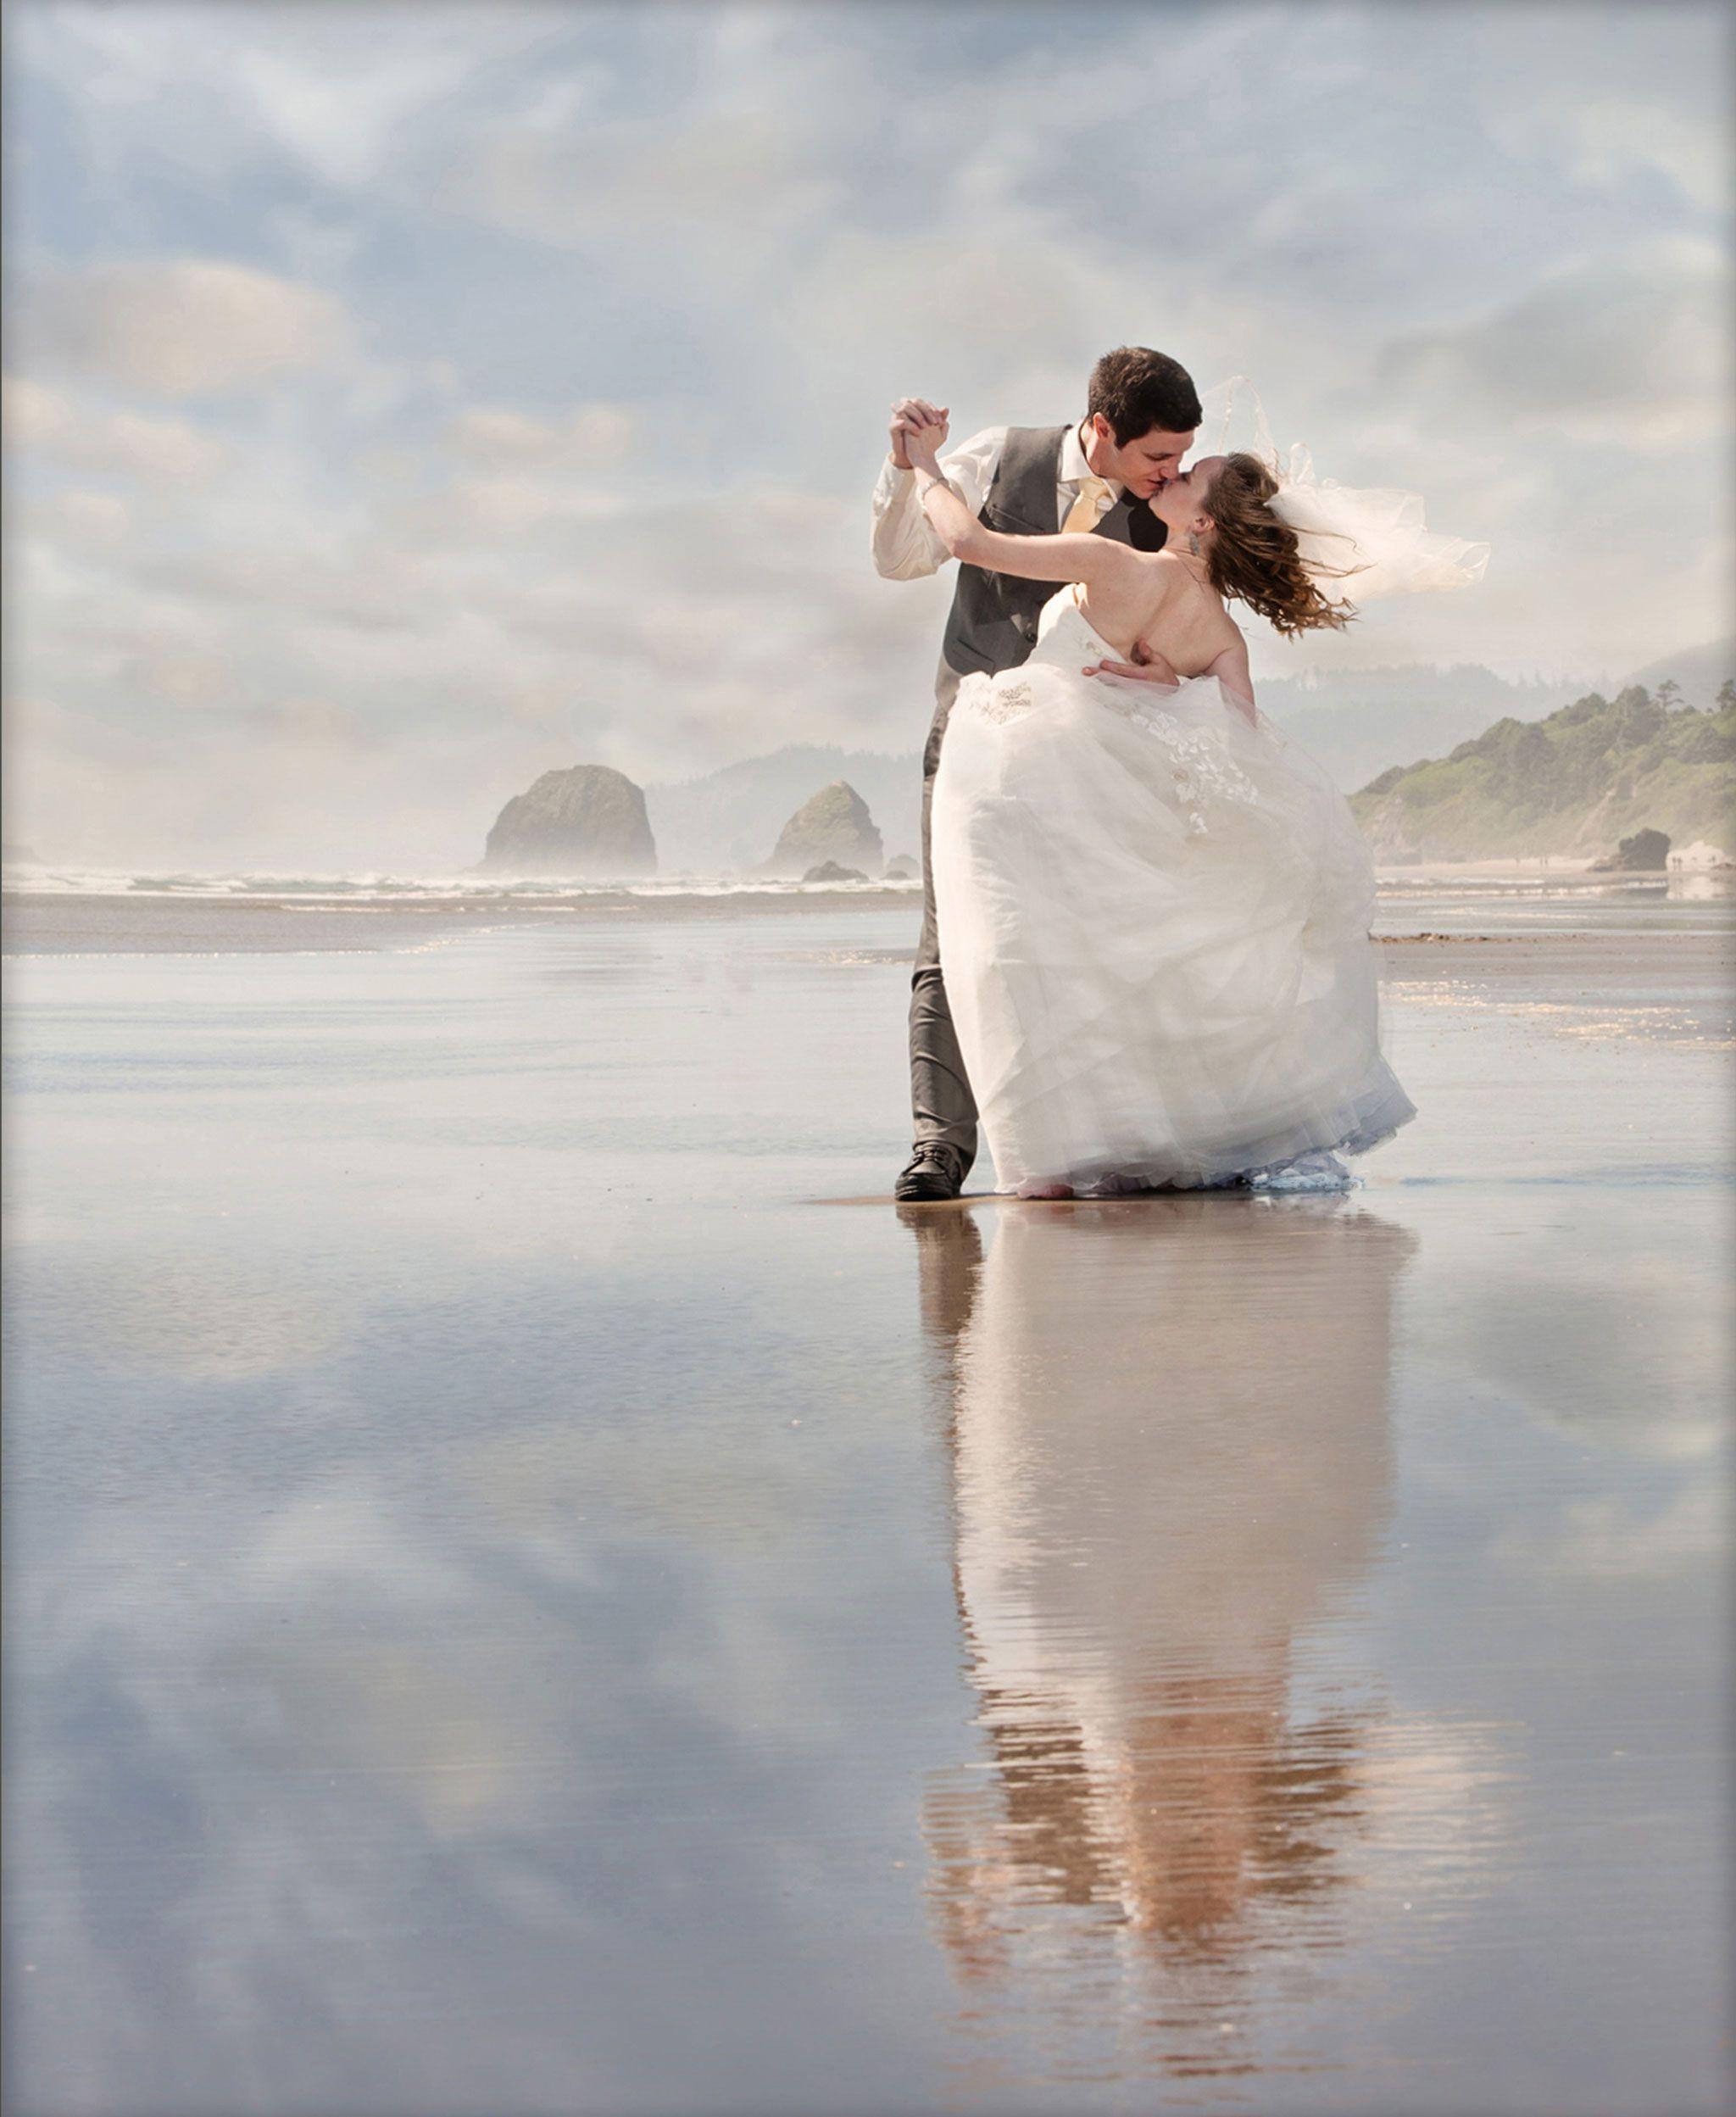 Killarney Waltz Sequence Dance Romantic Wedding Photos Romantic